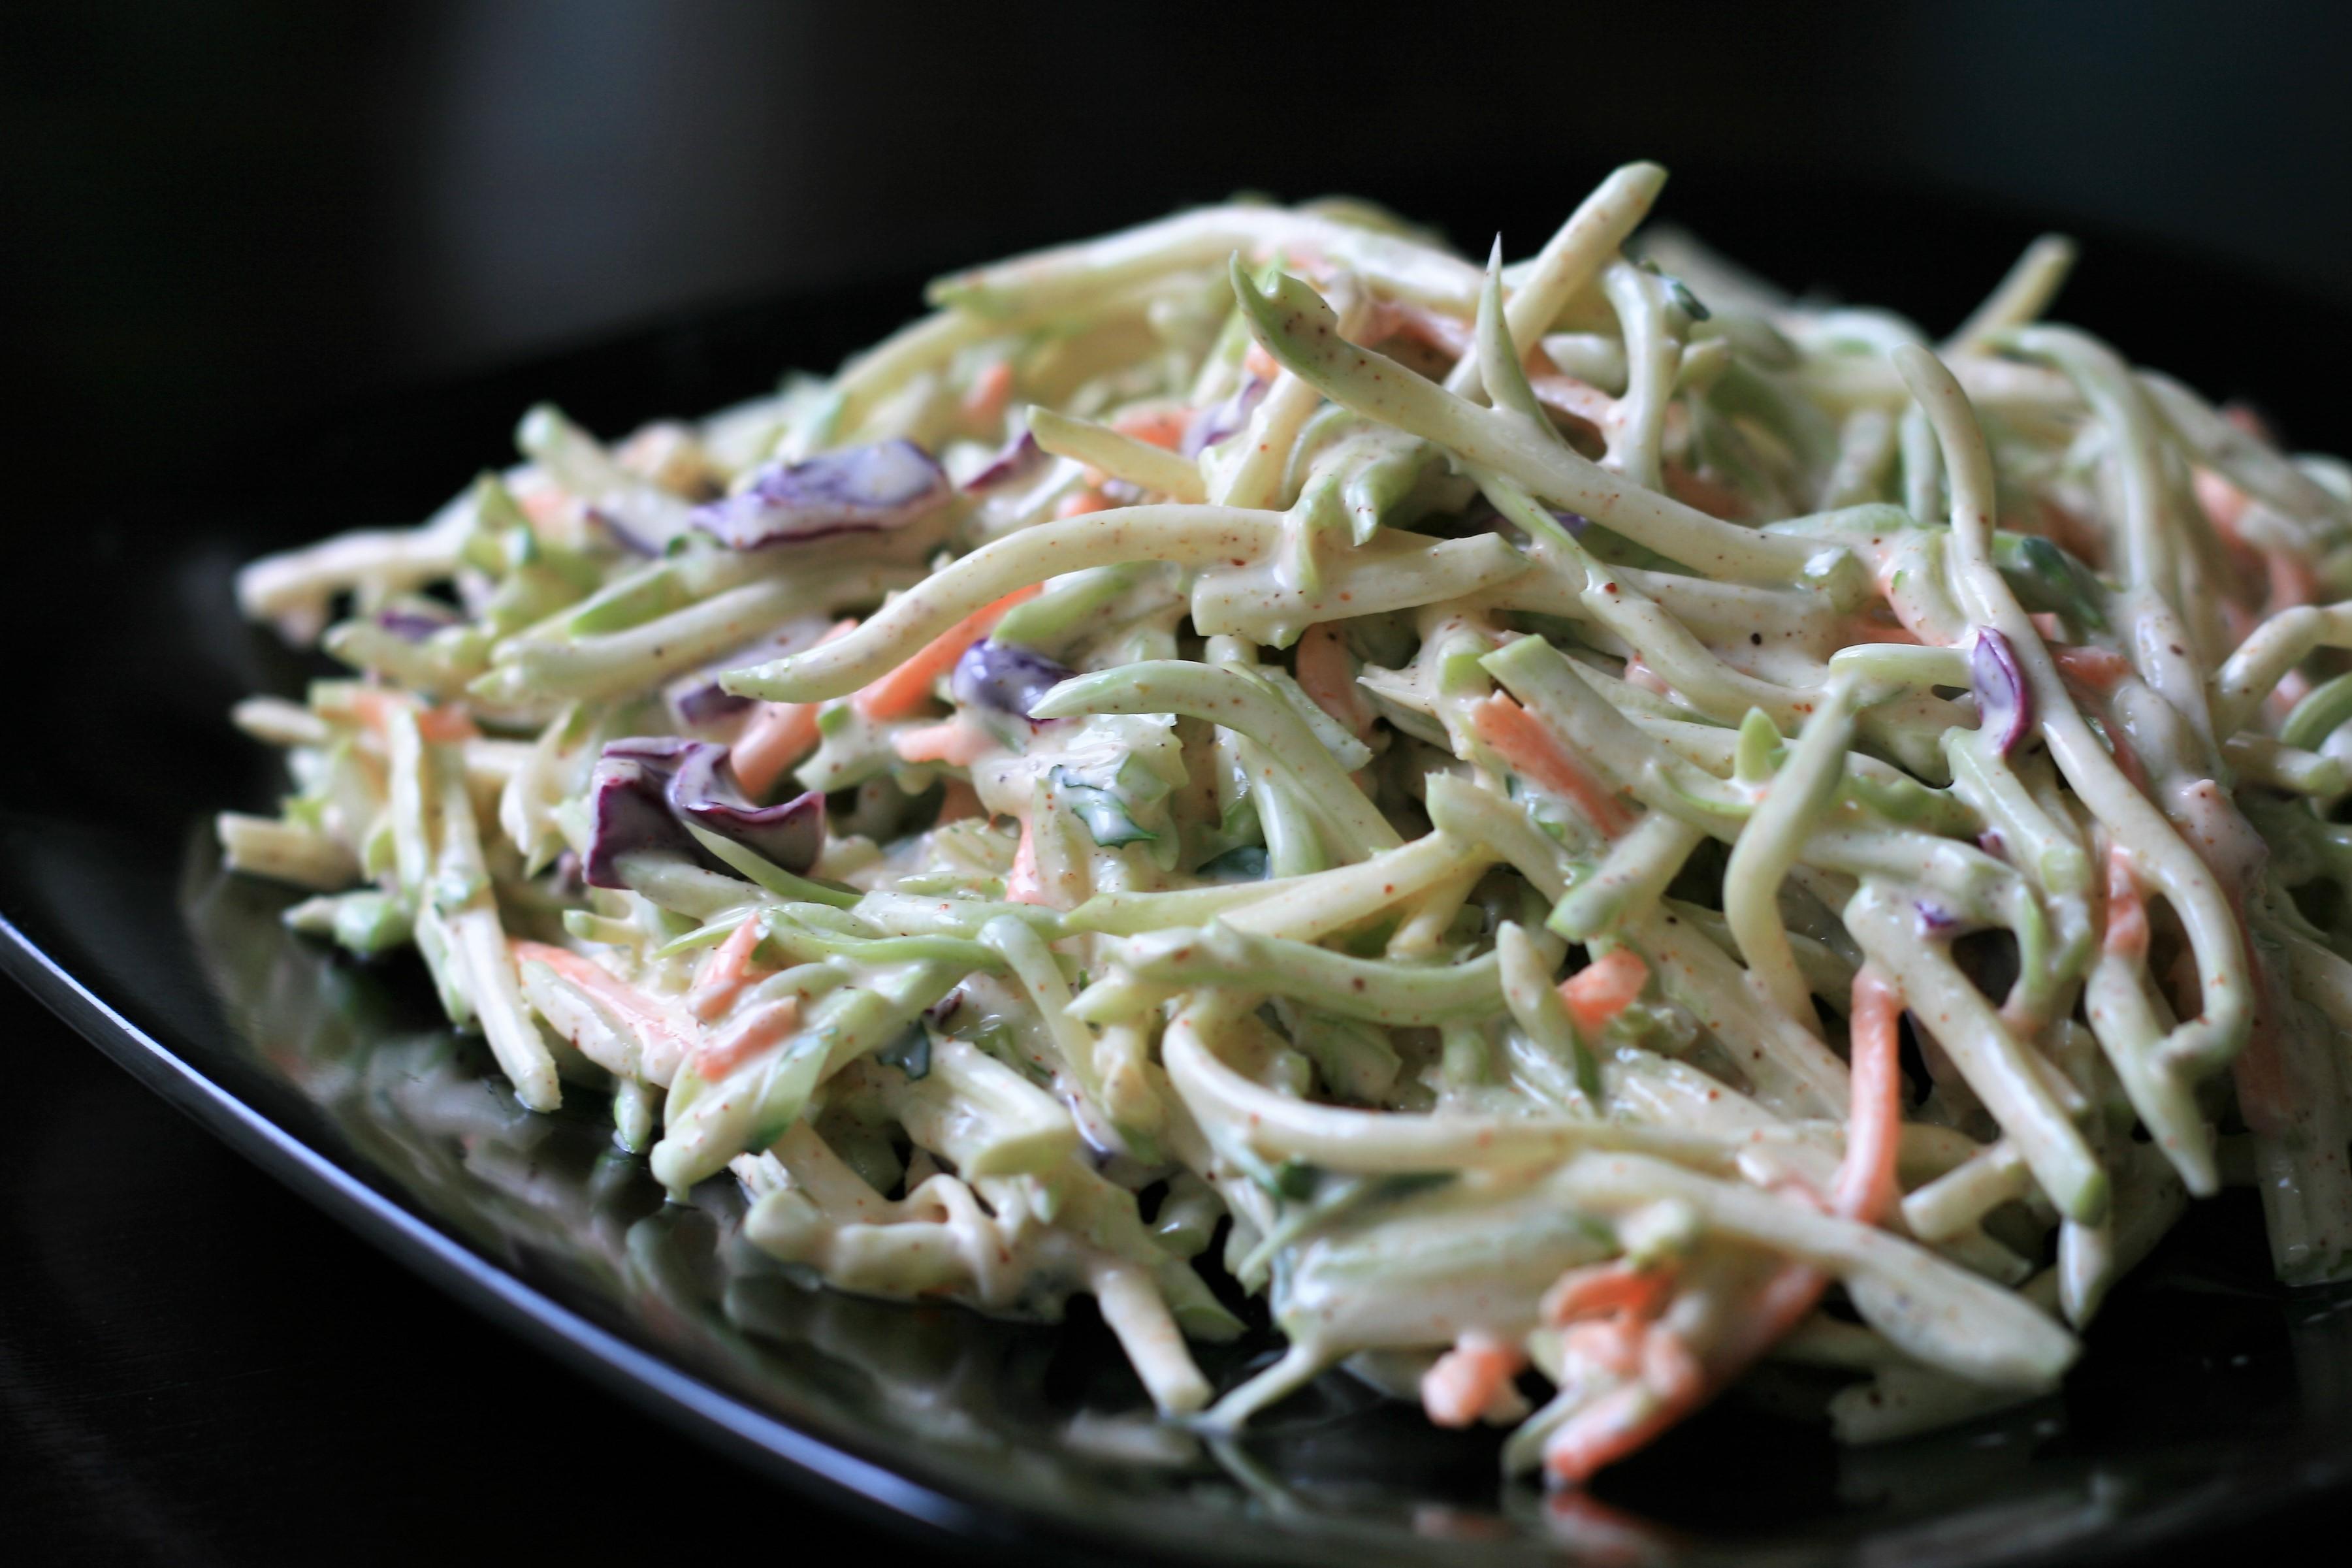 Broccoli Slaw with Spicy Dressing